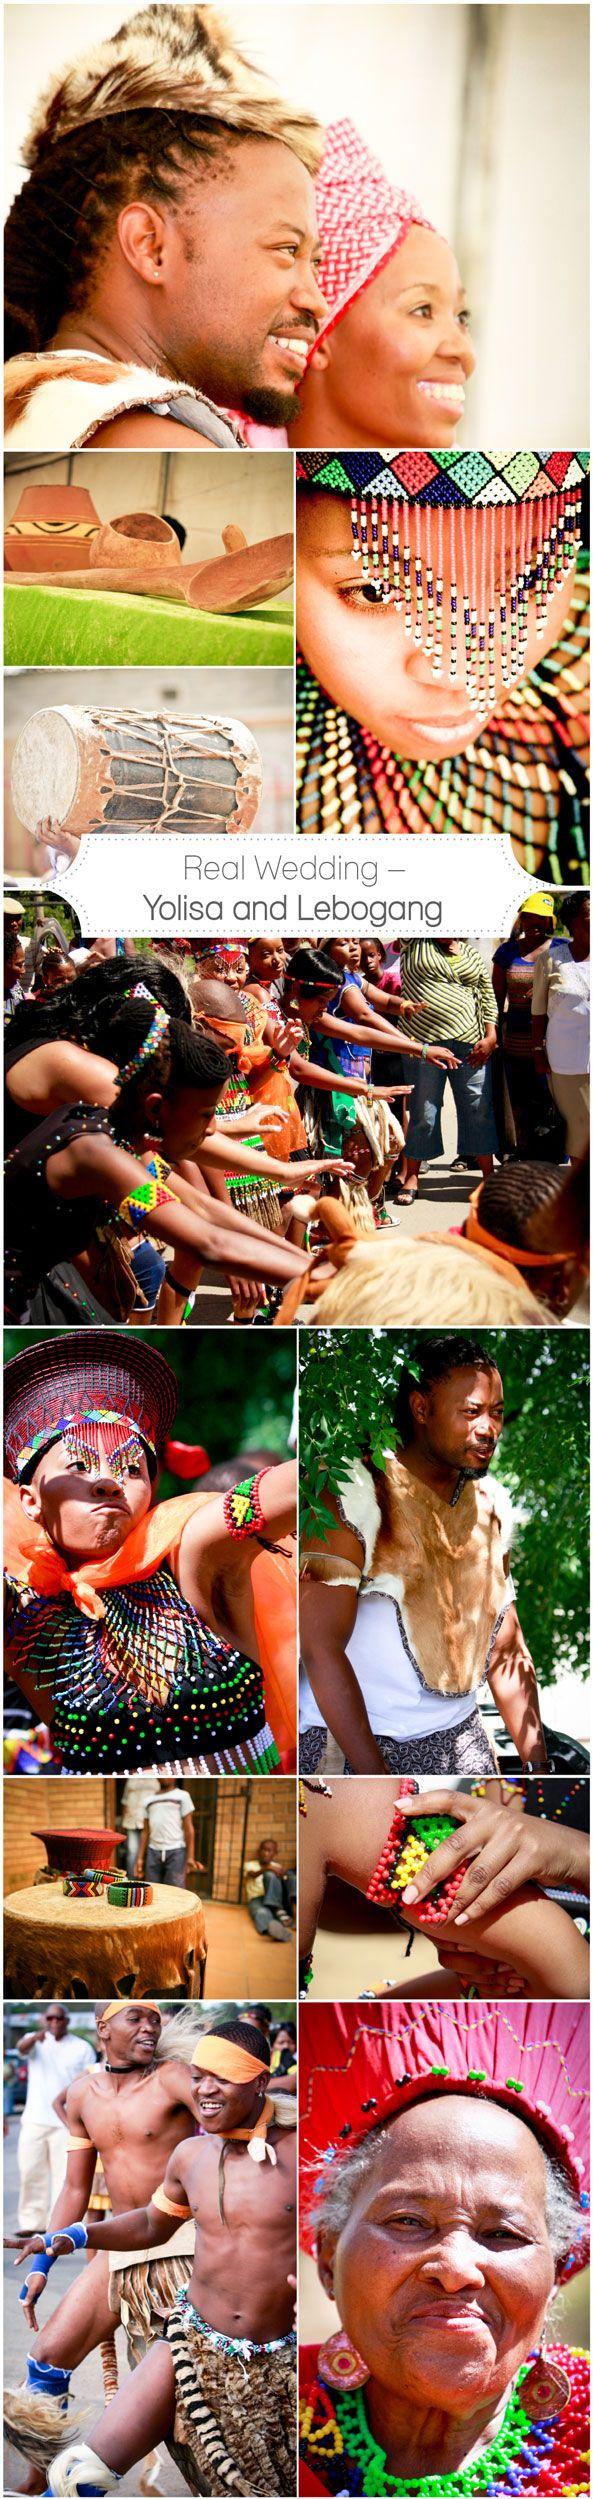 {Real Wedding} Yolisa and Lebogang (Part two) www.nubianbride.co.za